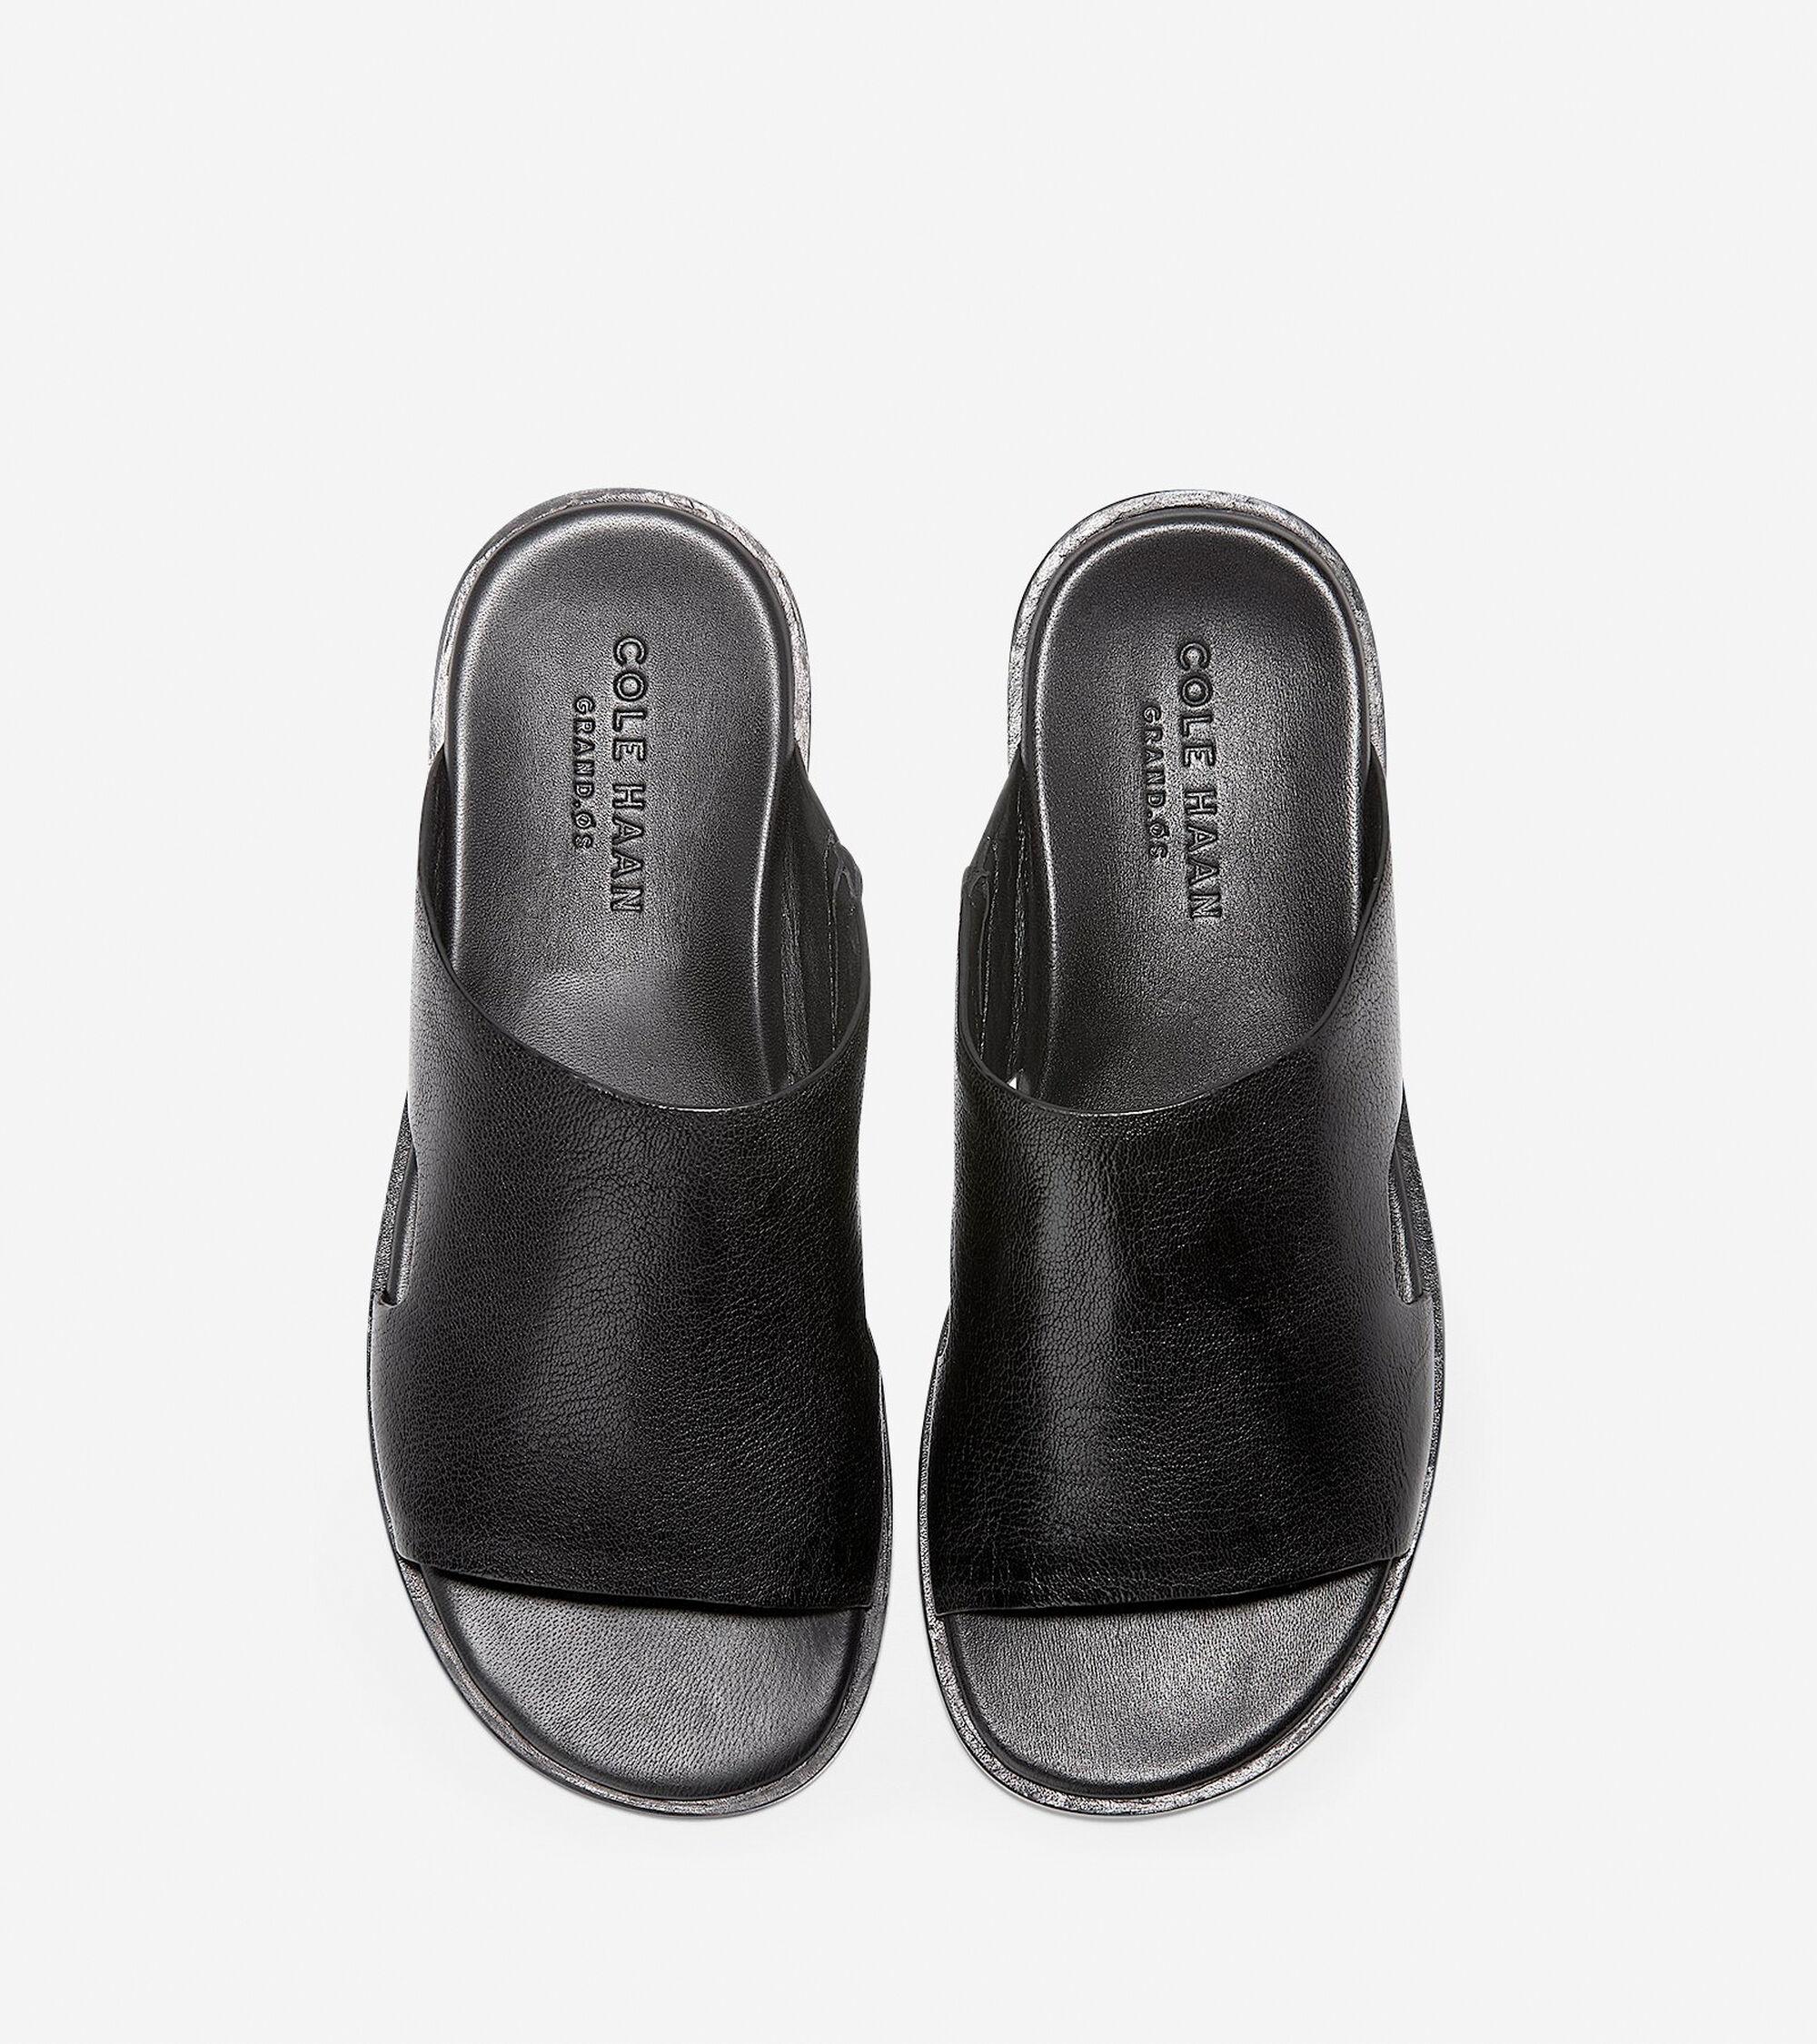 20c59ccc1 ... Goldwyn Slide Sandal · Goldwyn Slide Sandal · Goldwyn Slide Sandal.   COLEHAAN